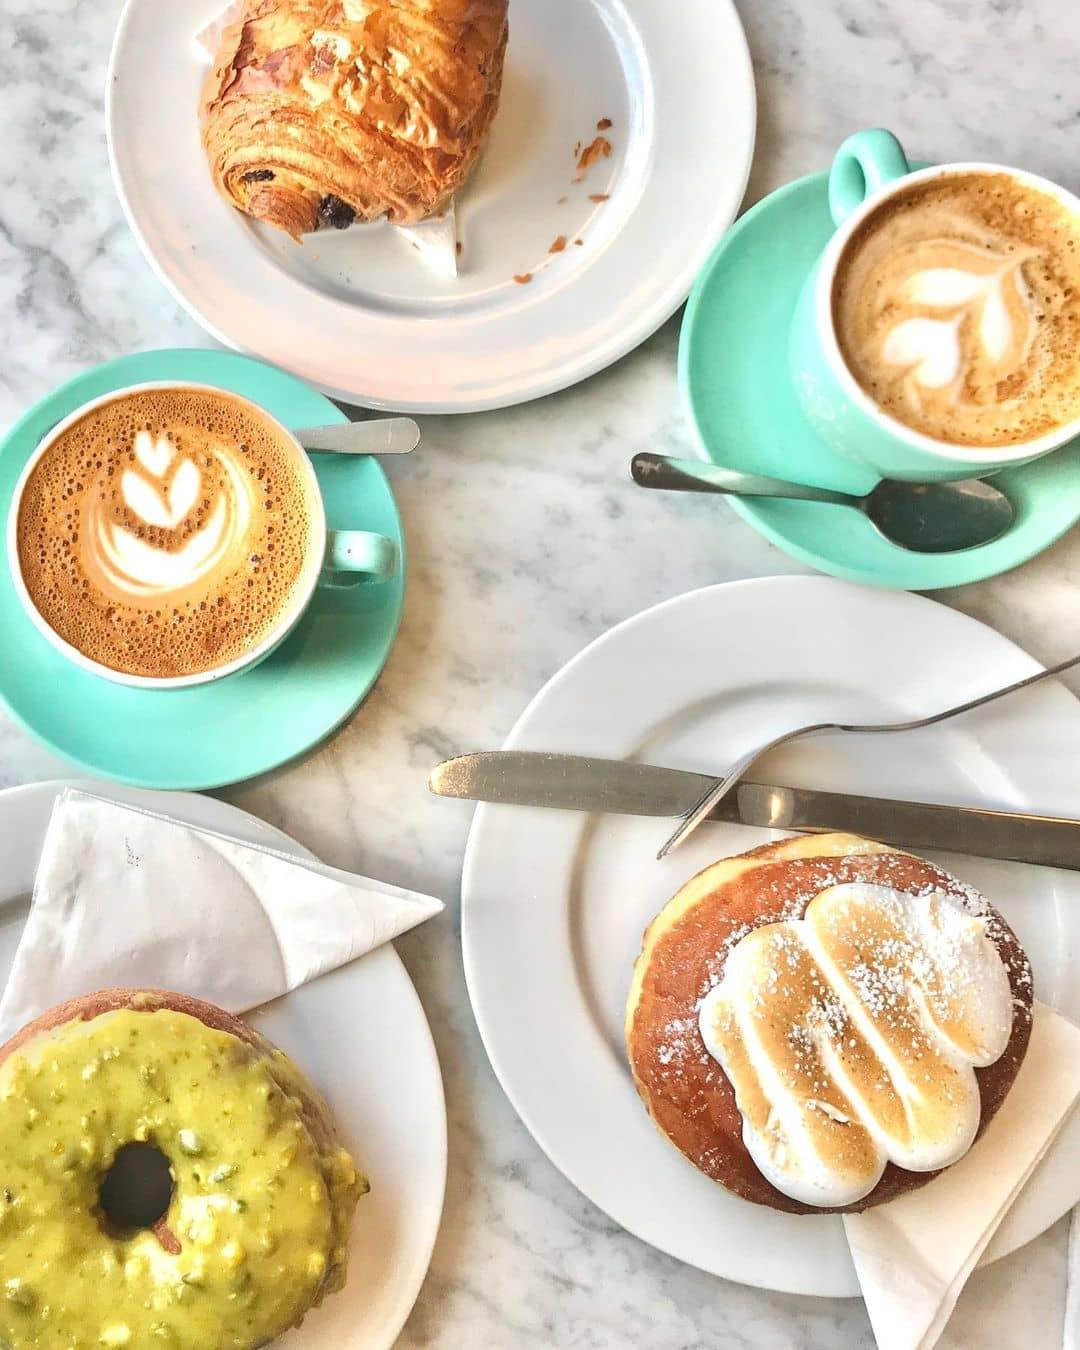 kitsilano neighbourhood guide 49th parallel coffee 1